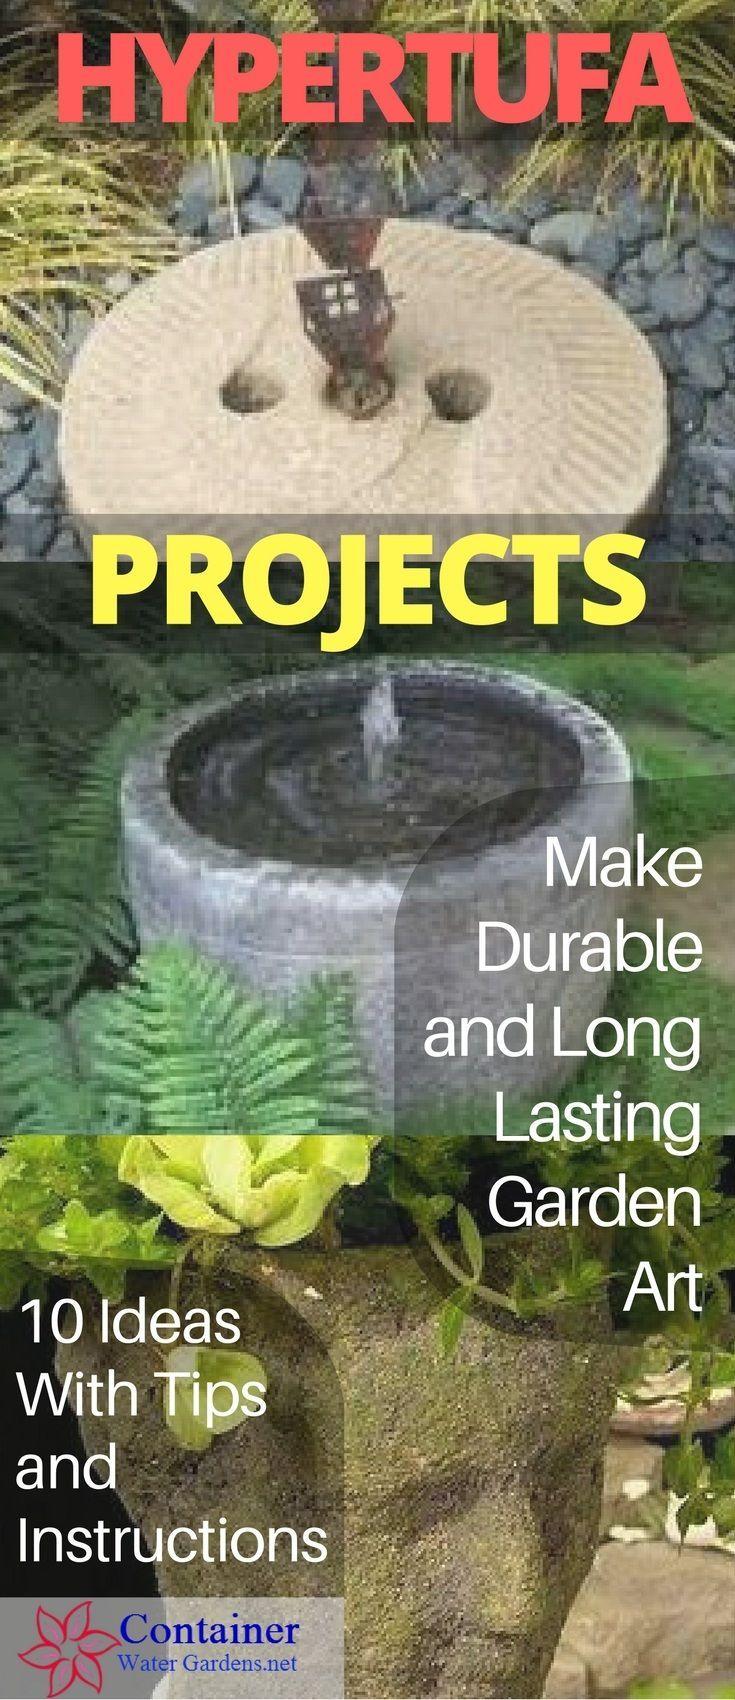 Make Lightweight Garden Art Projects That Last With Hypertufa - ContainerWaterGardens.net